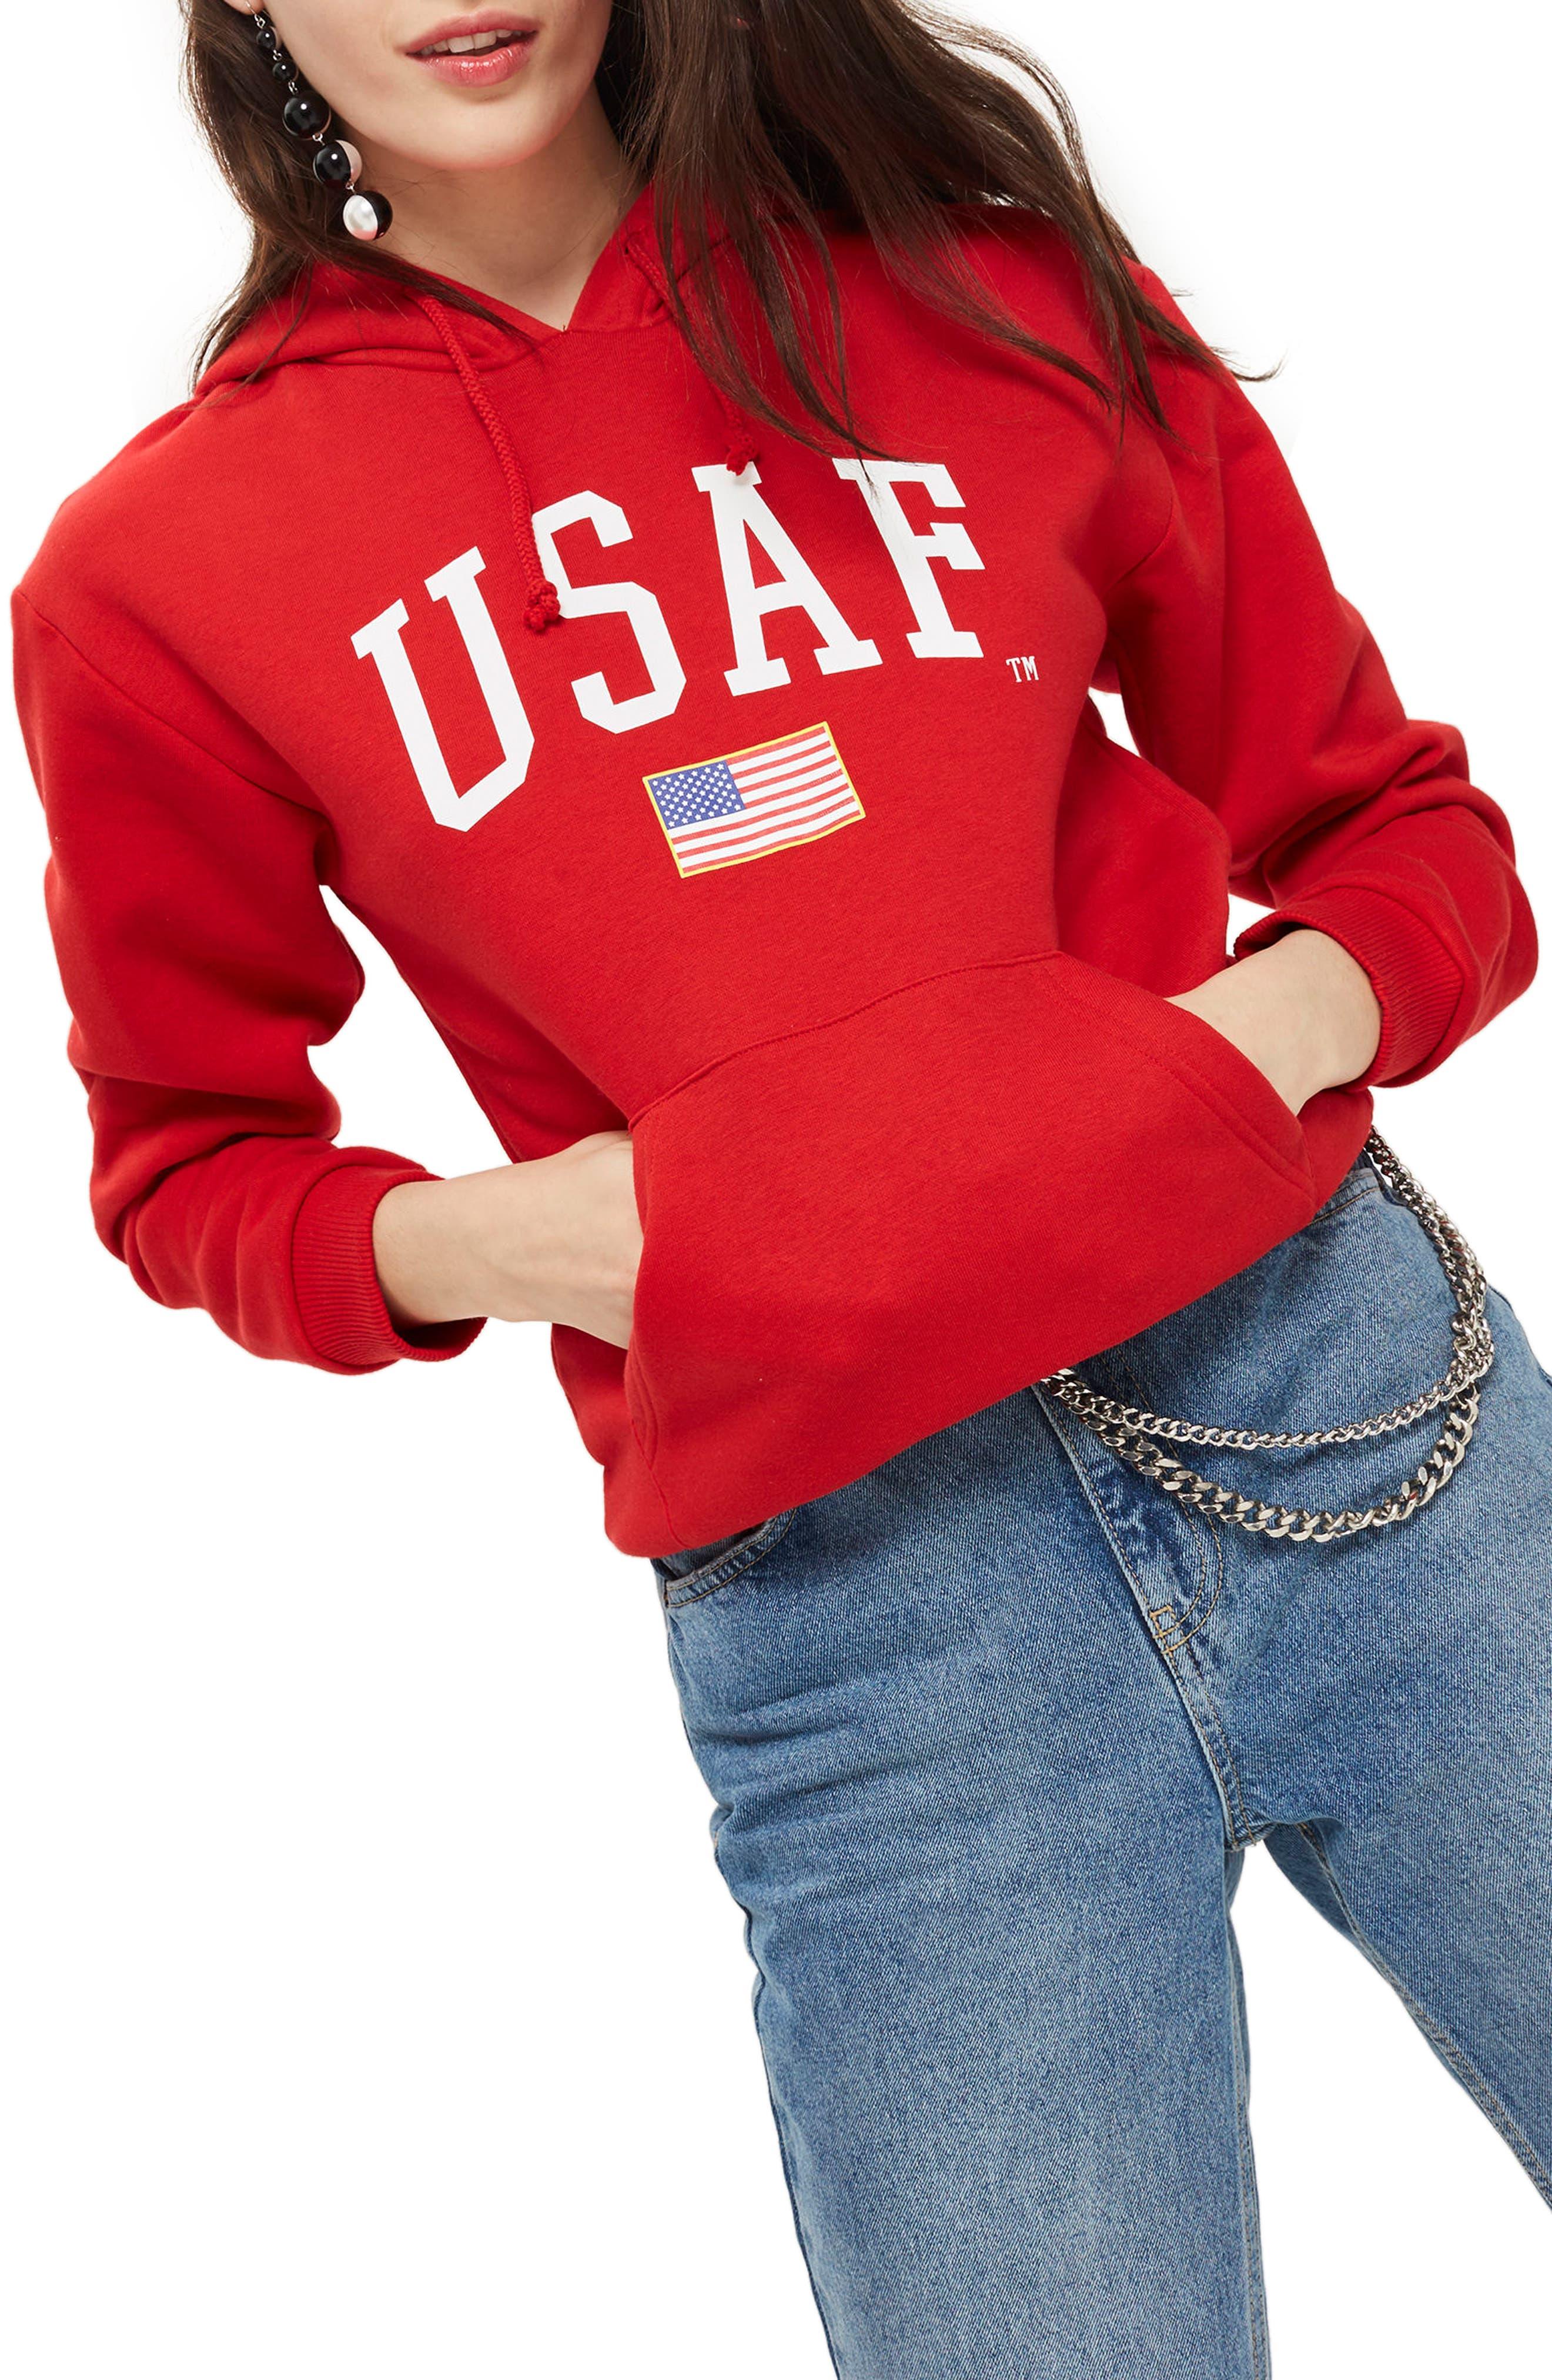 by Tee & Cake USAF Logo Hoodie,                         Main,                         color, Red Multi